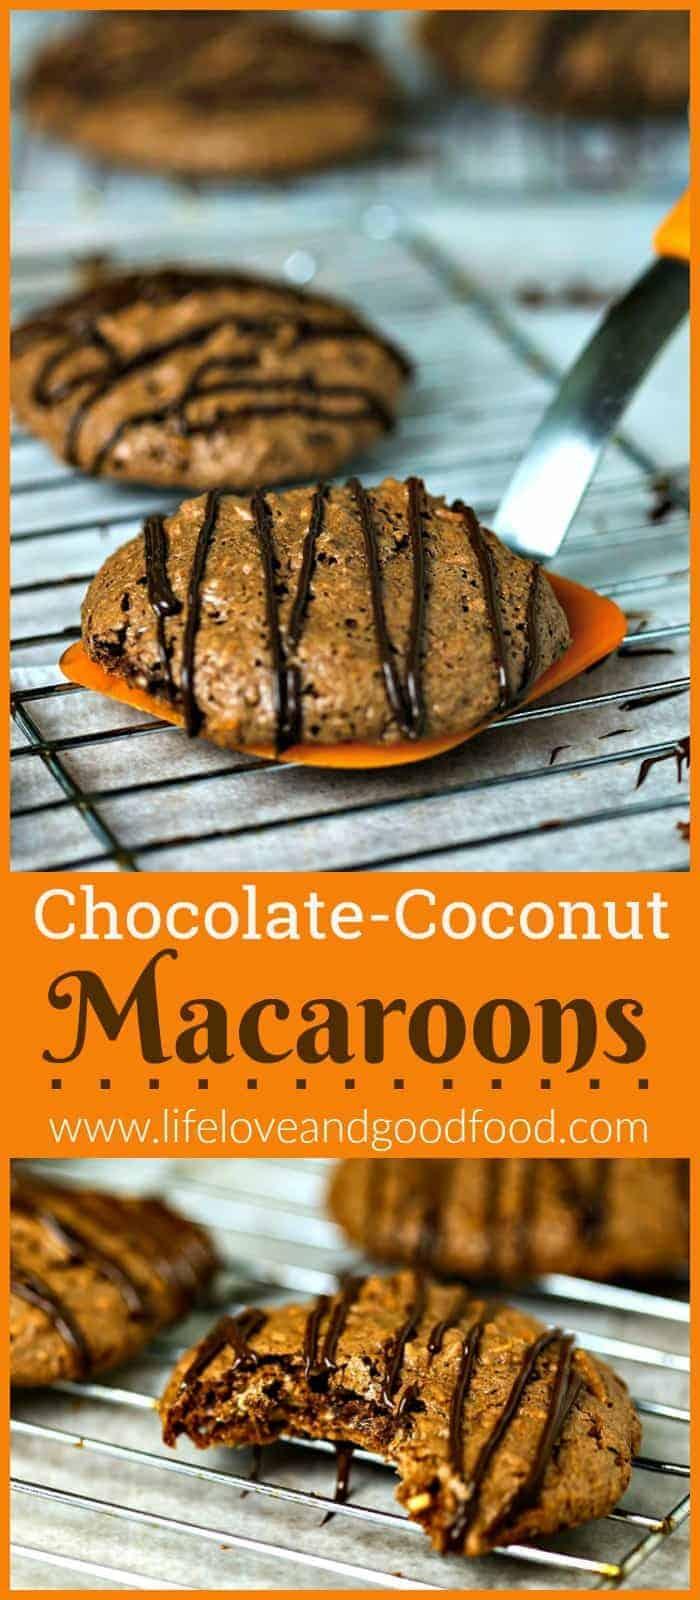 Chocolate-Coconut Macaroons   Life, Love, and Good Food